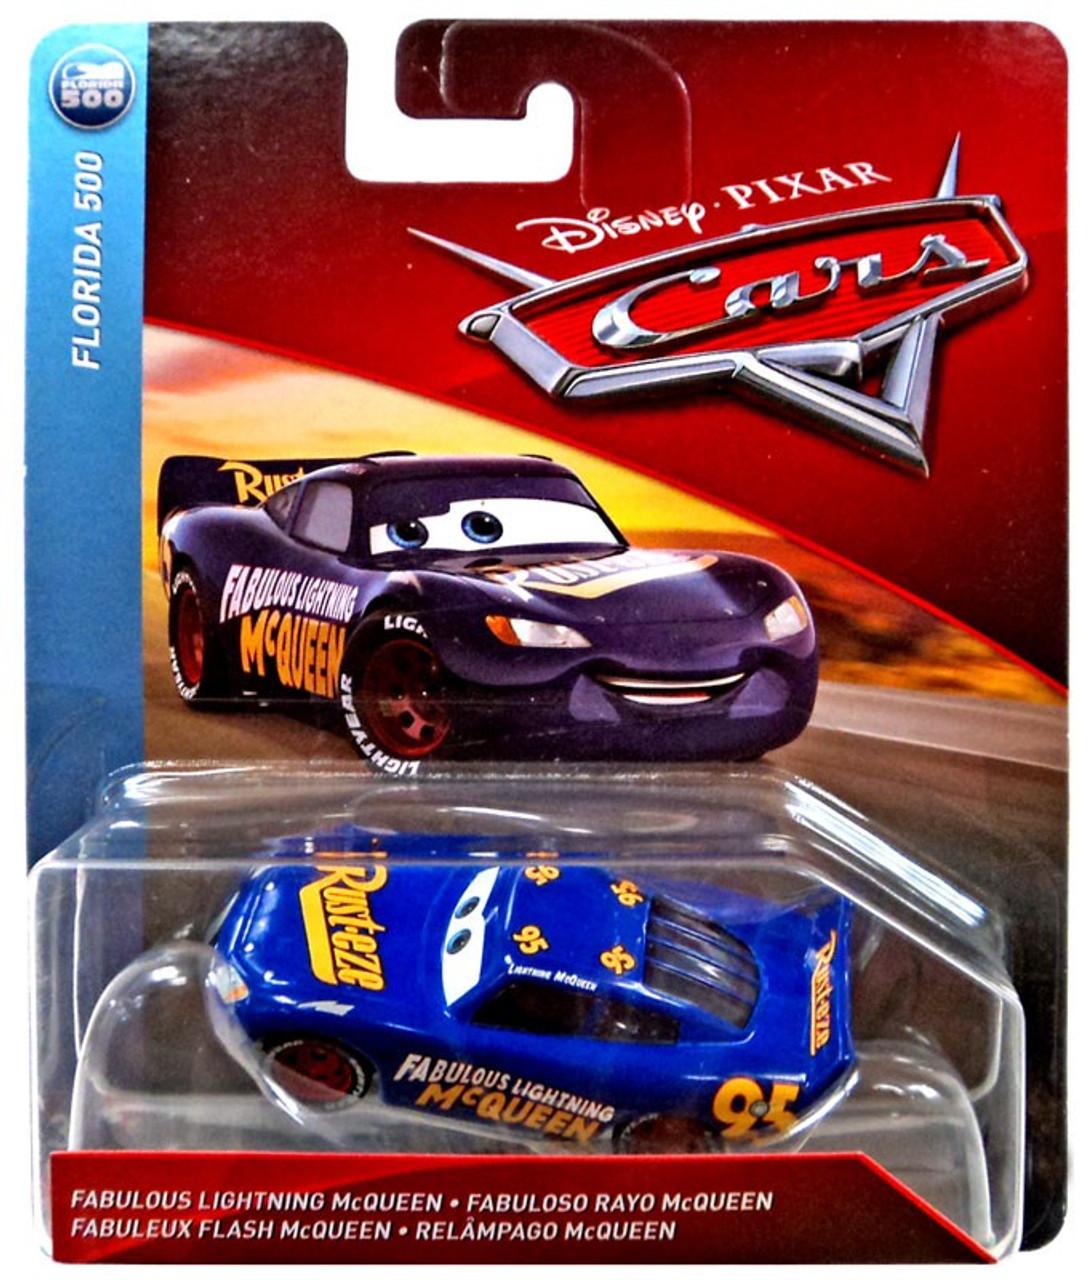 disney pixar cars cars 3 florida 500 fabulous lightning mcqueen 155